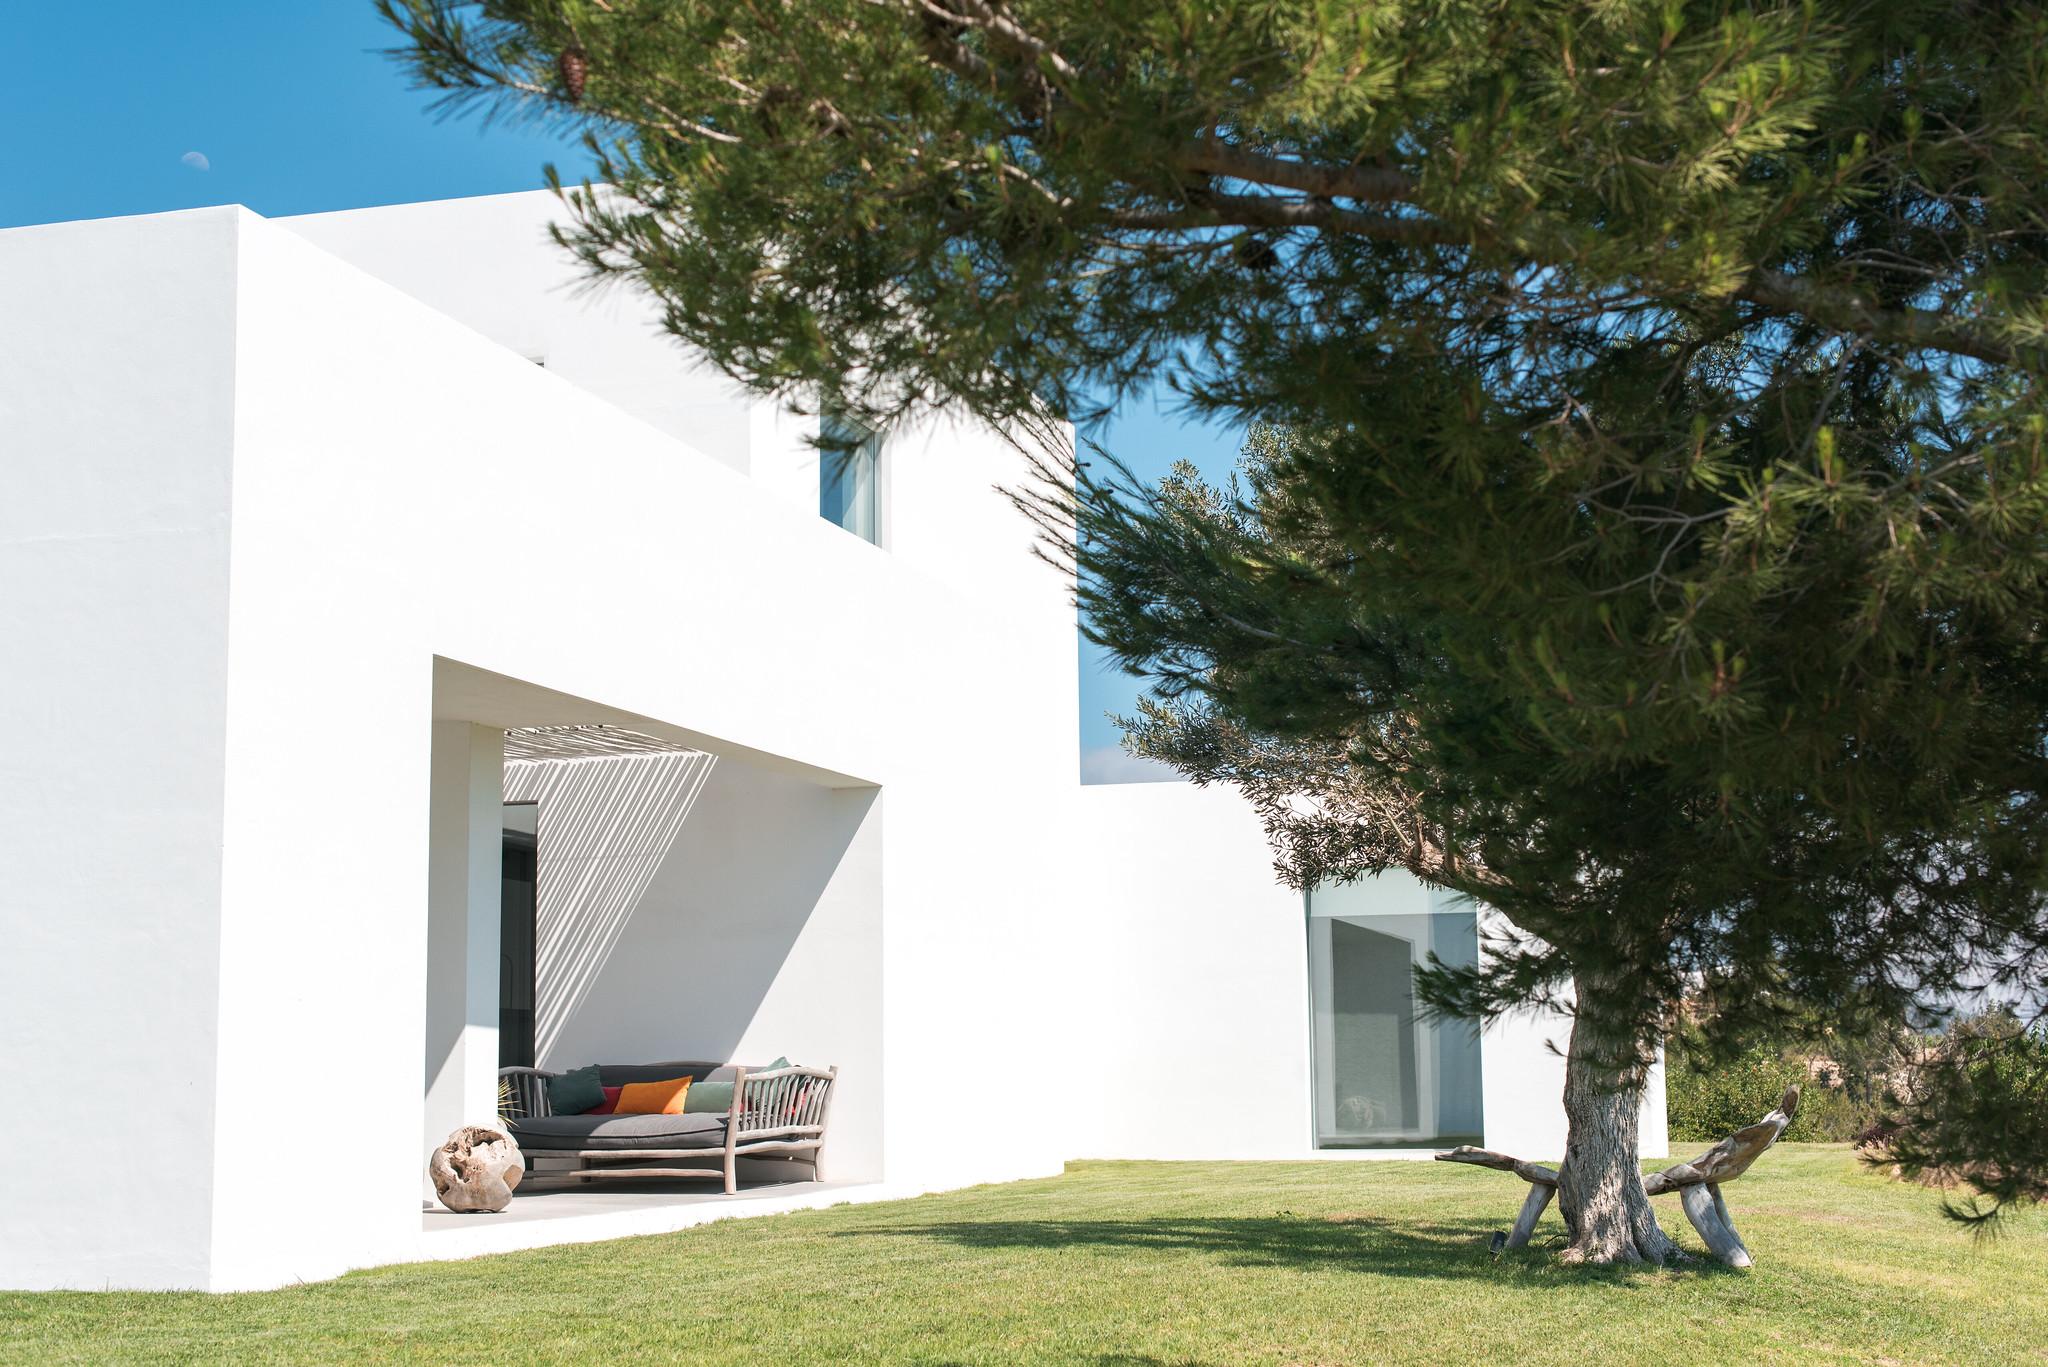 https://www.white-ibiza.com/wp-content/uploads/2020/05/white-ibiza-villas-can-zama-side.jpg